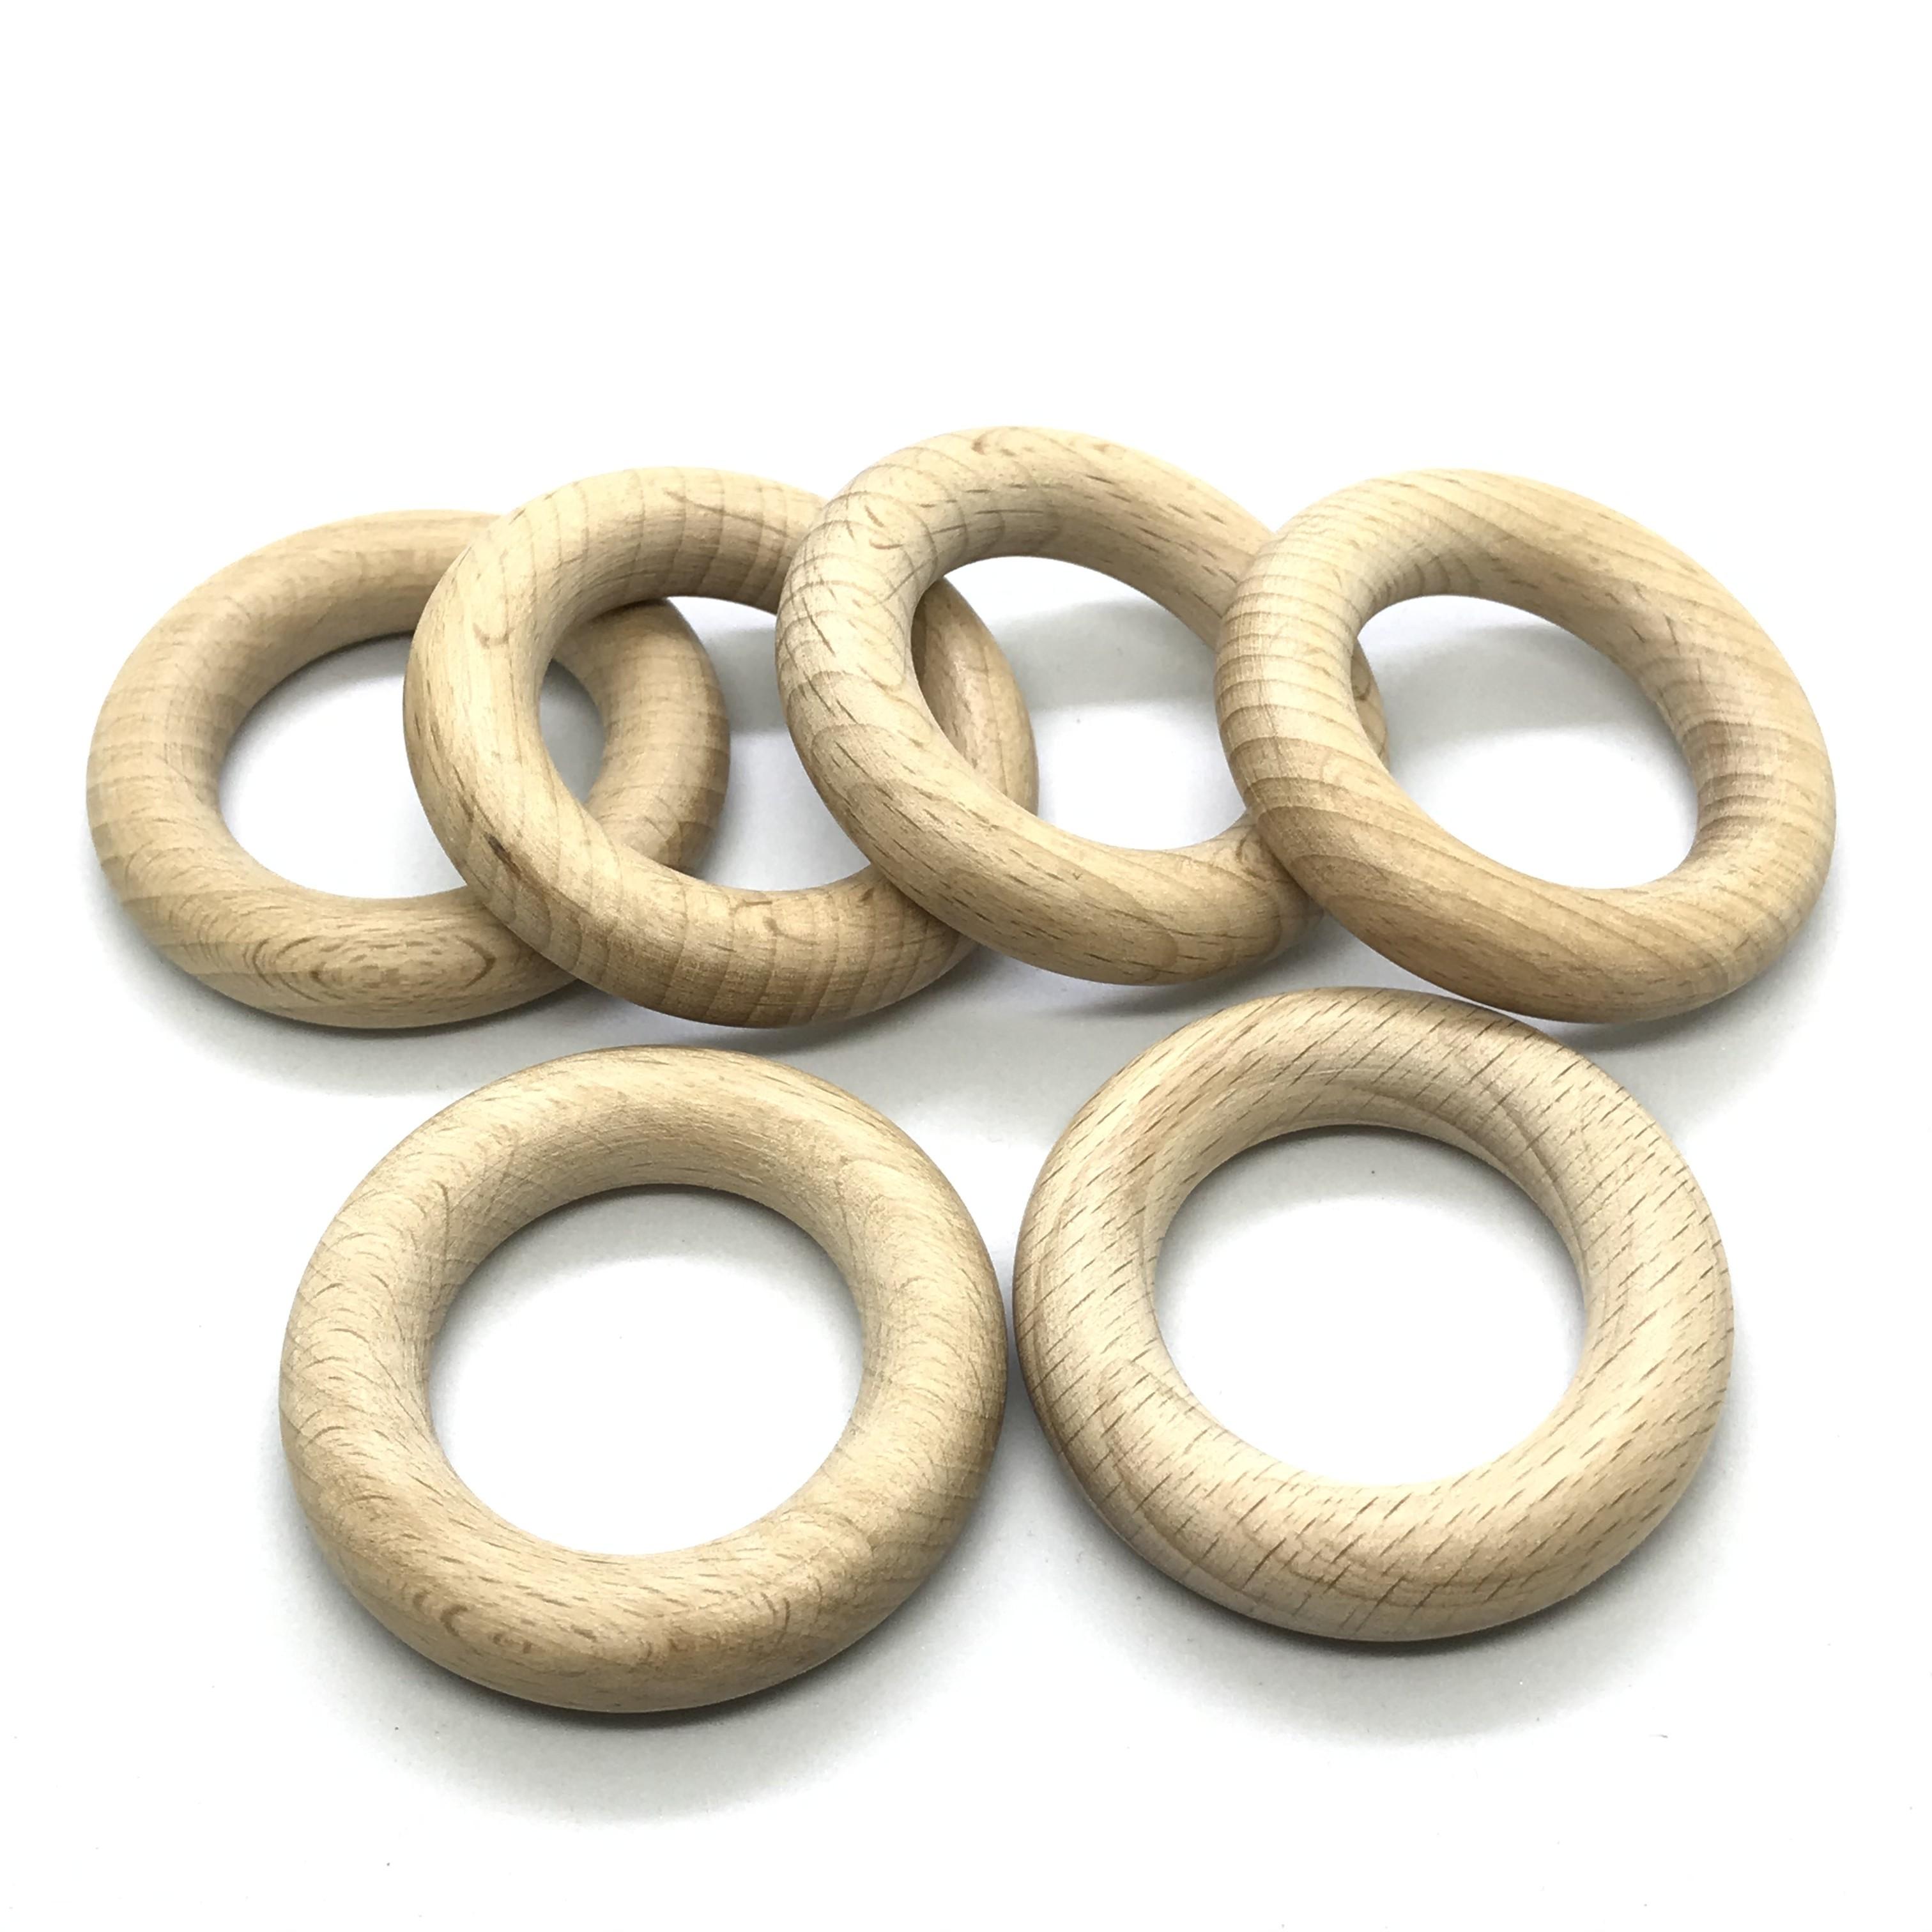 25pcs 5.0cm Organic Beech Wood Ring